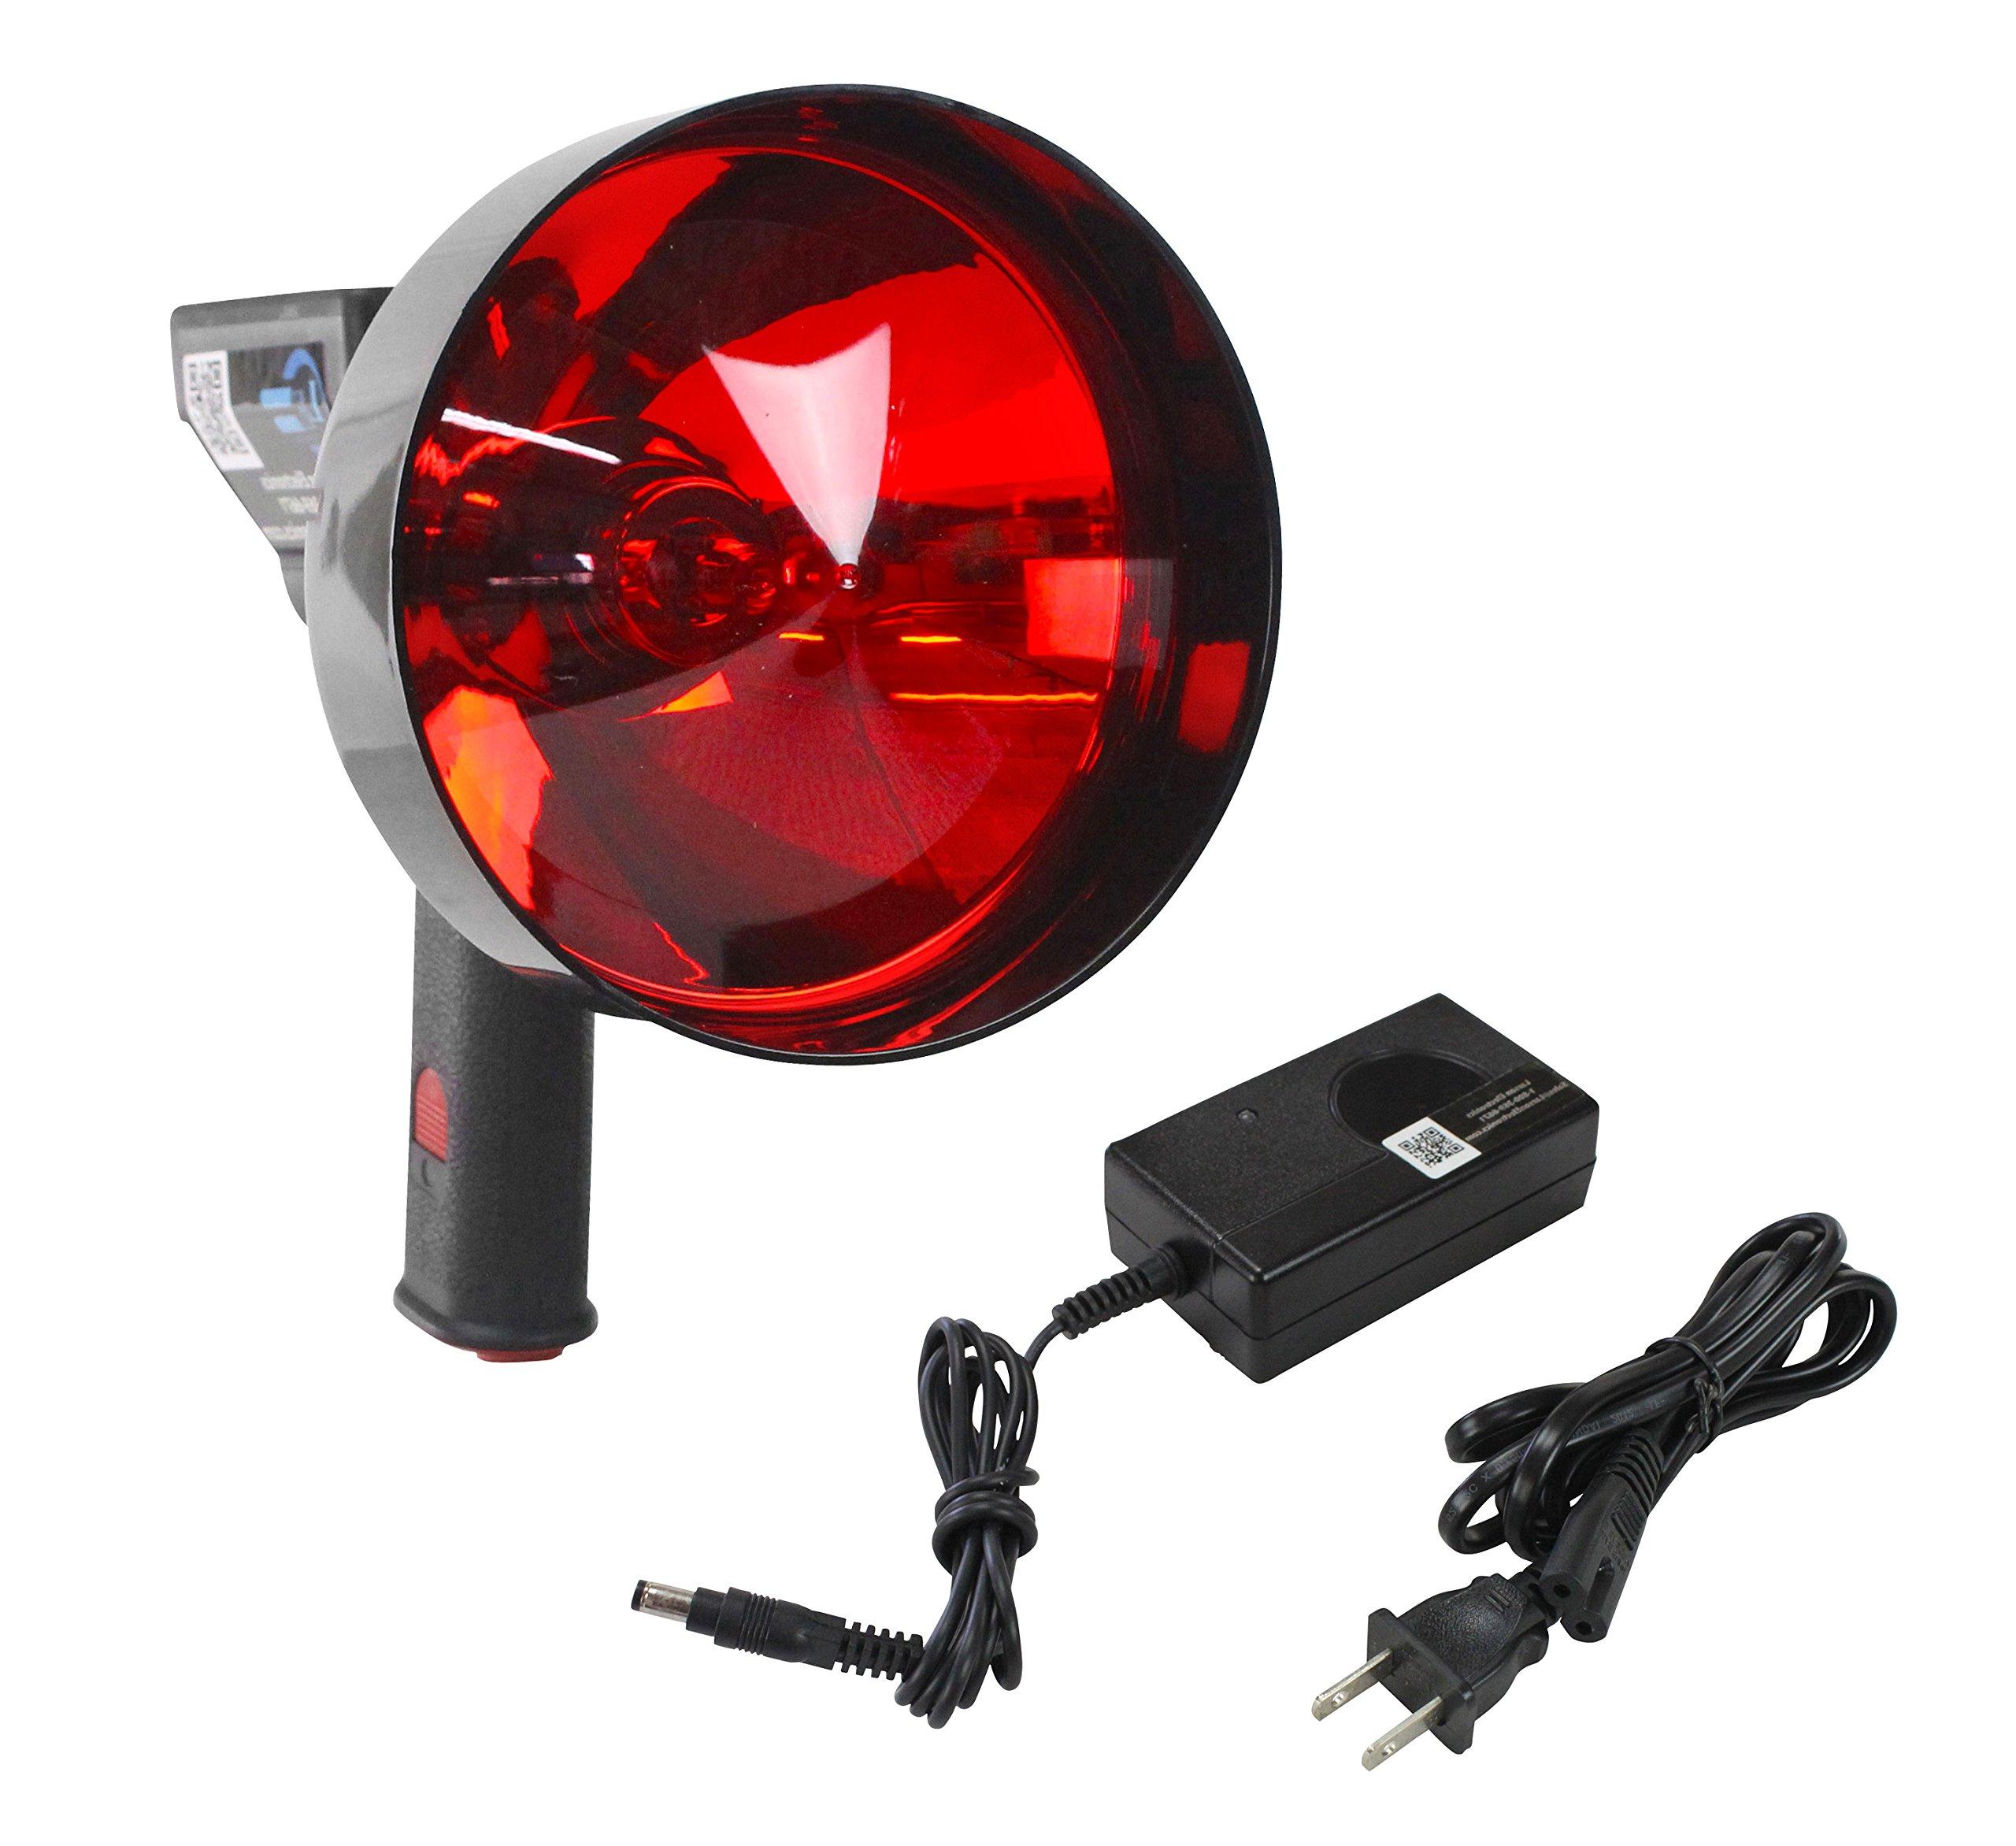 5 Million Candlepower Handheld Rechargeable Spotlight - Red Hunting Lens - 5''/7'' Lens - Spot/Flood(-